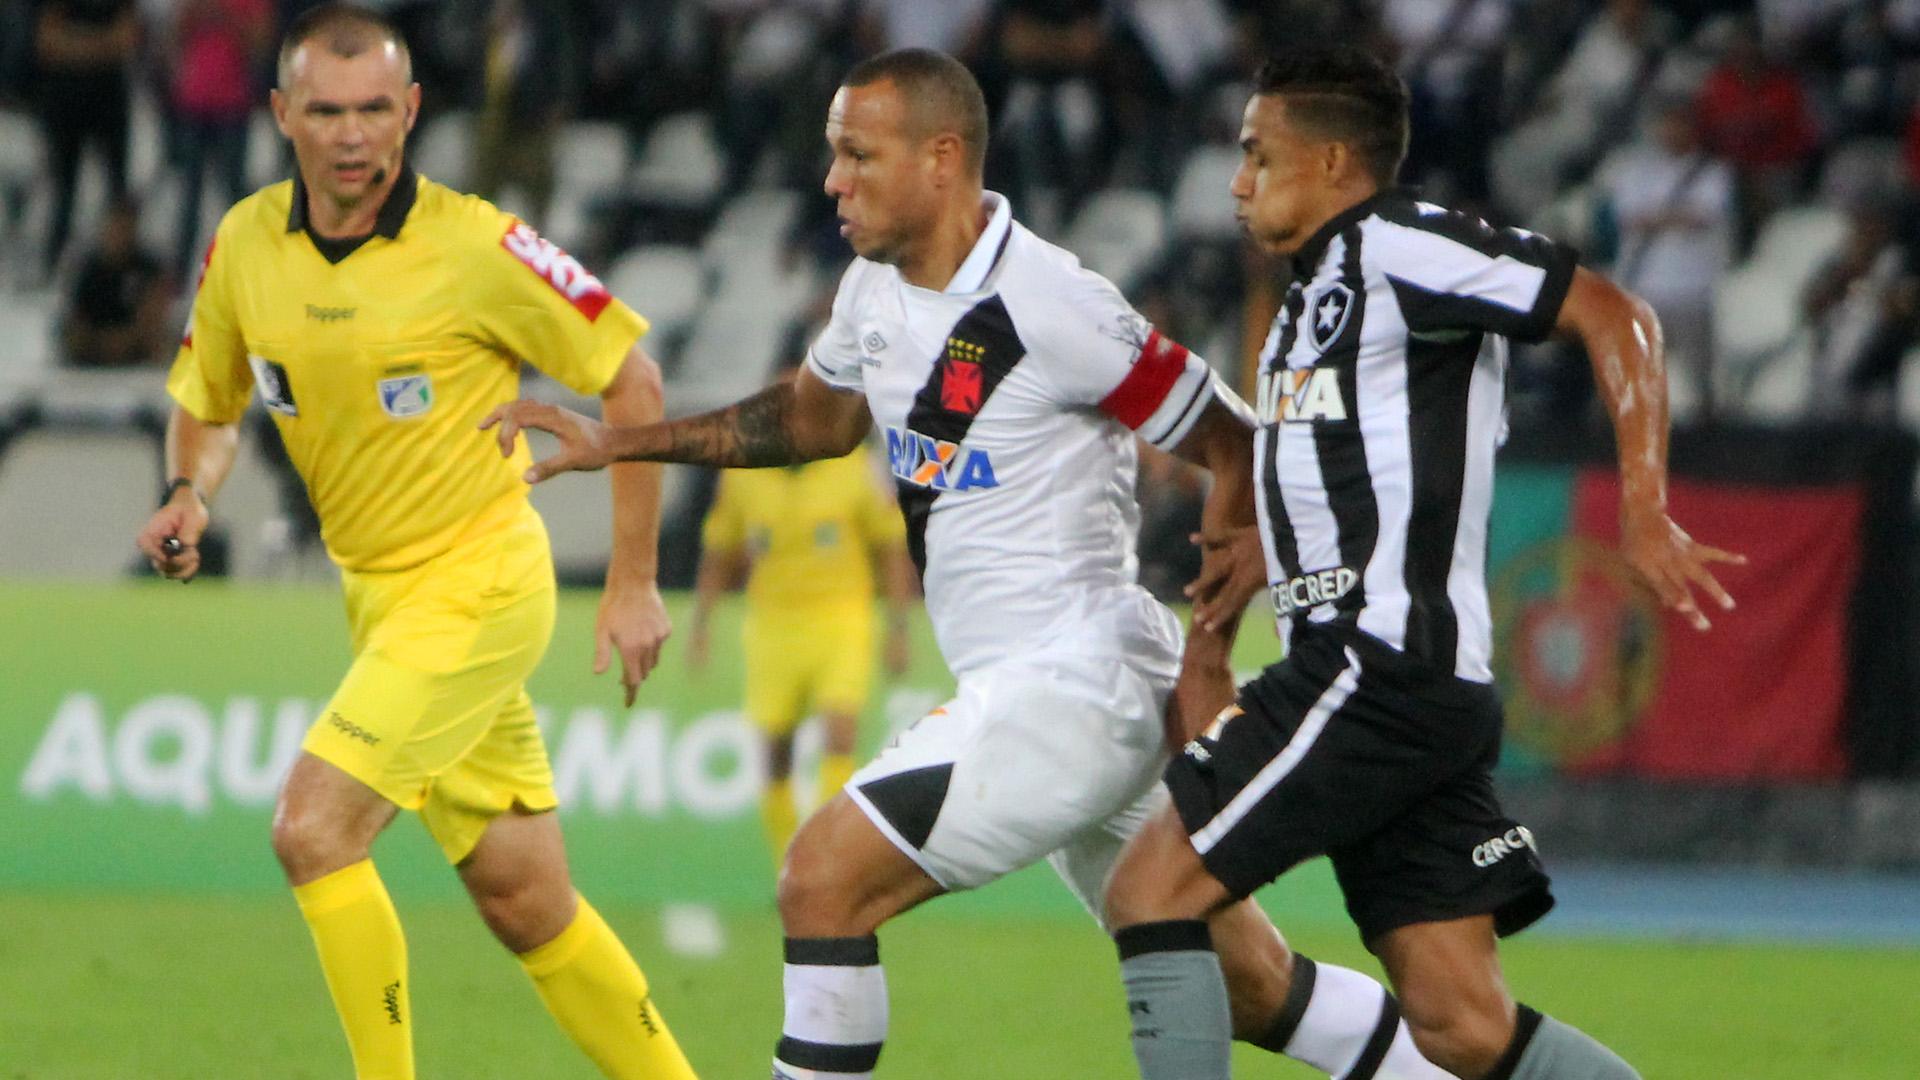 Arnaldo Luis Fabiano Botafogo Vasco Brasileirao Serie A 21062017